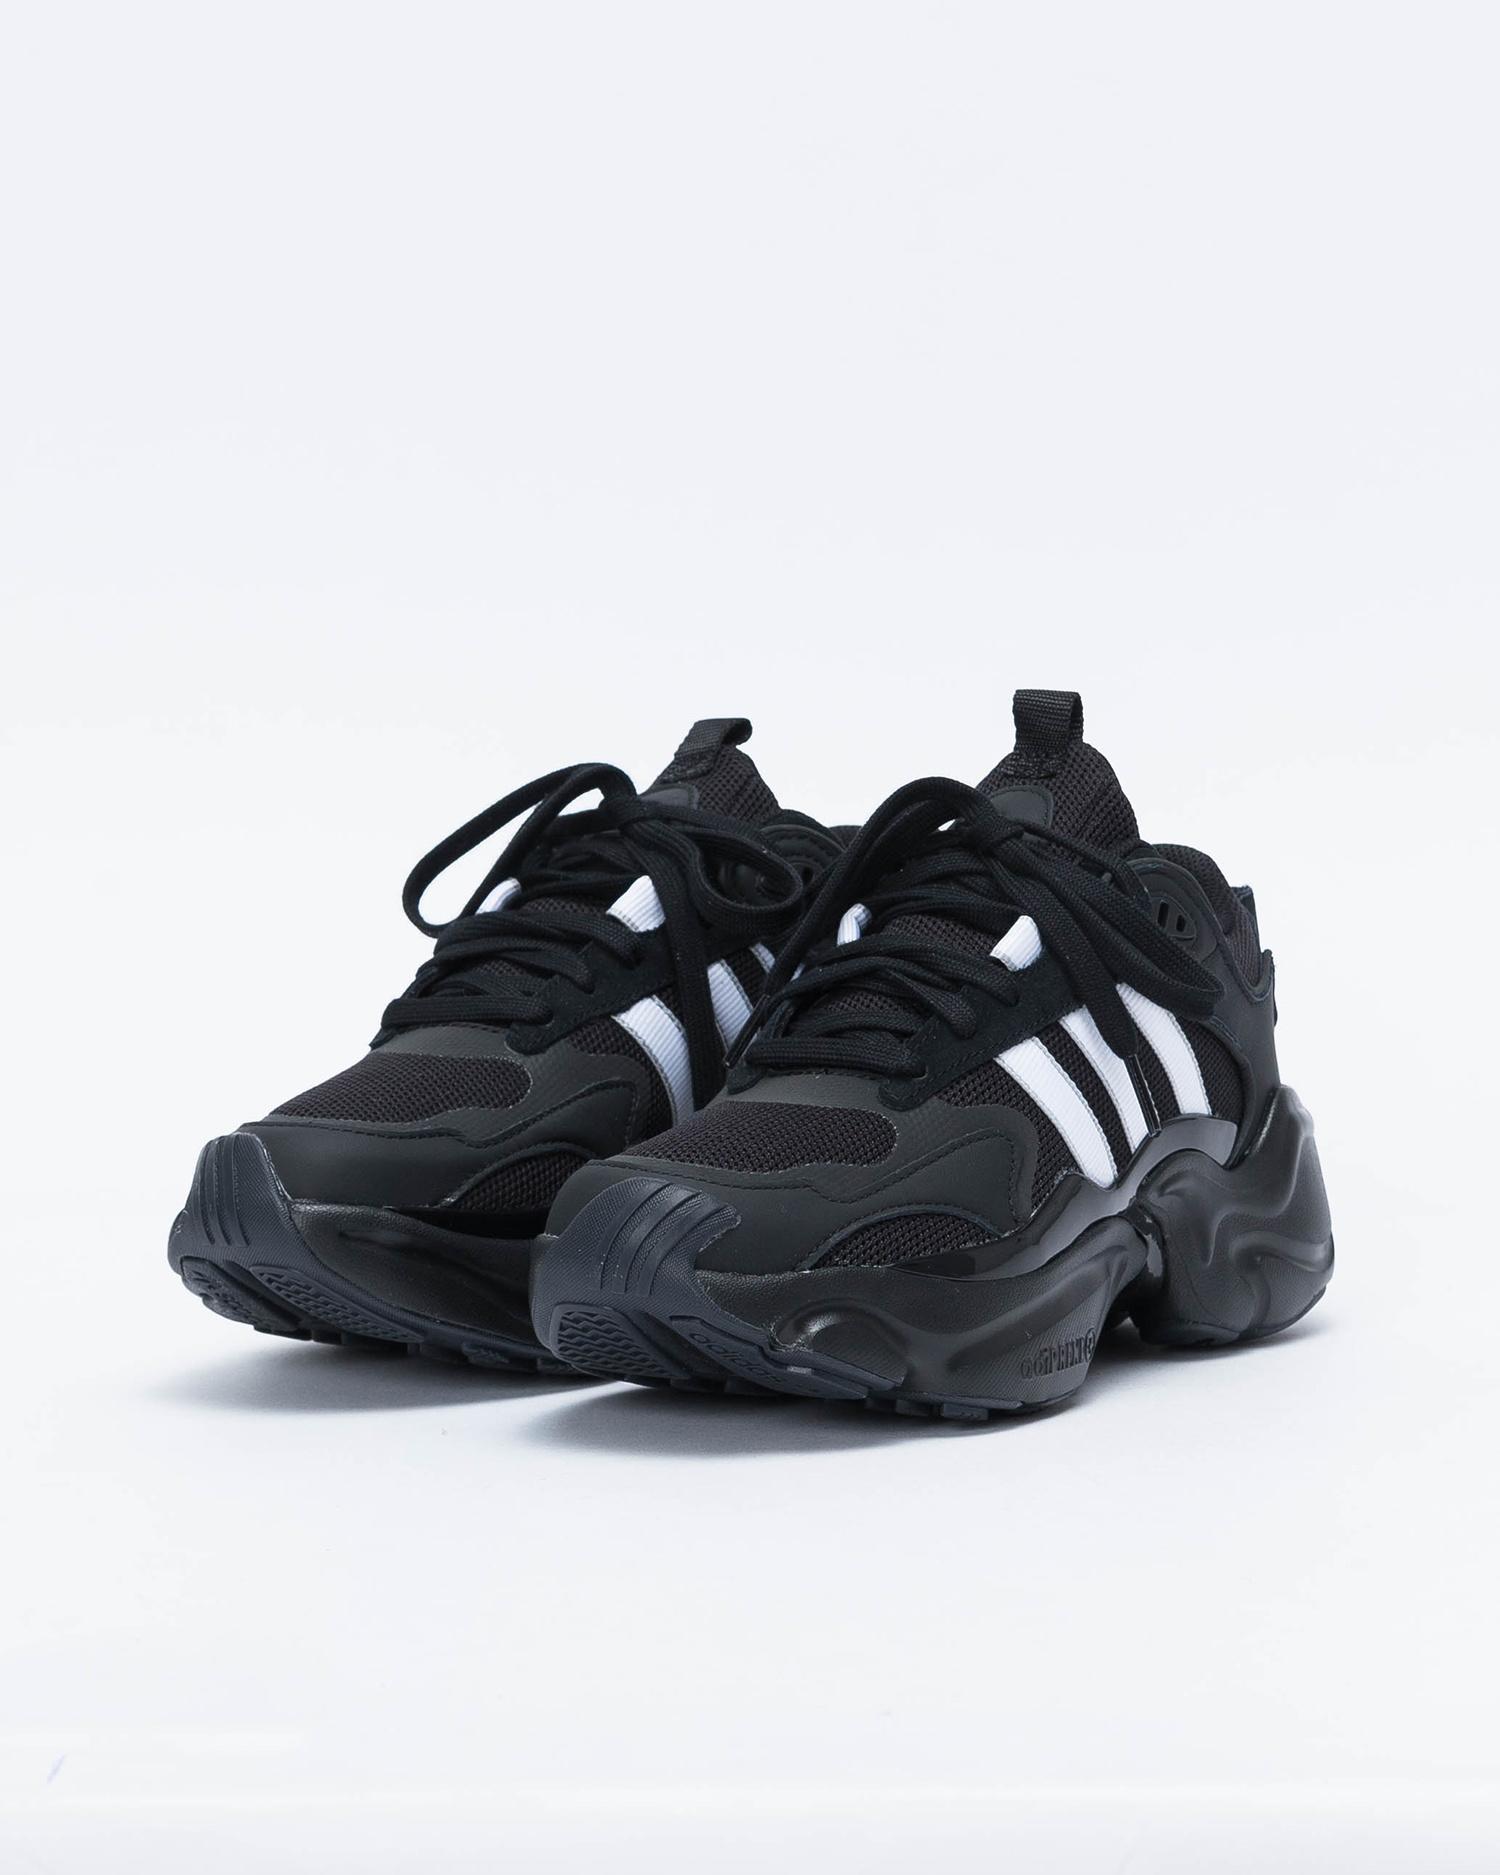 Adidas Magmur Runner W Cblack/Ftwwht/Gretwo